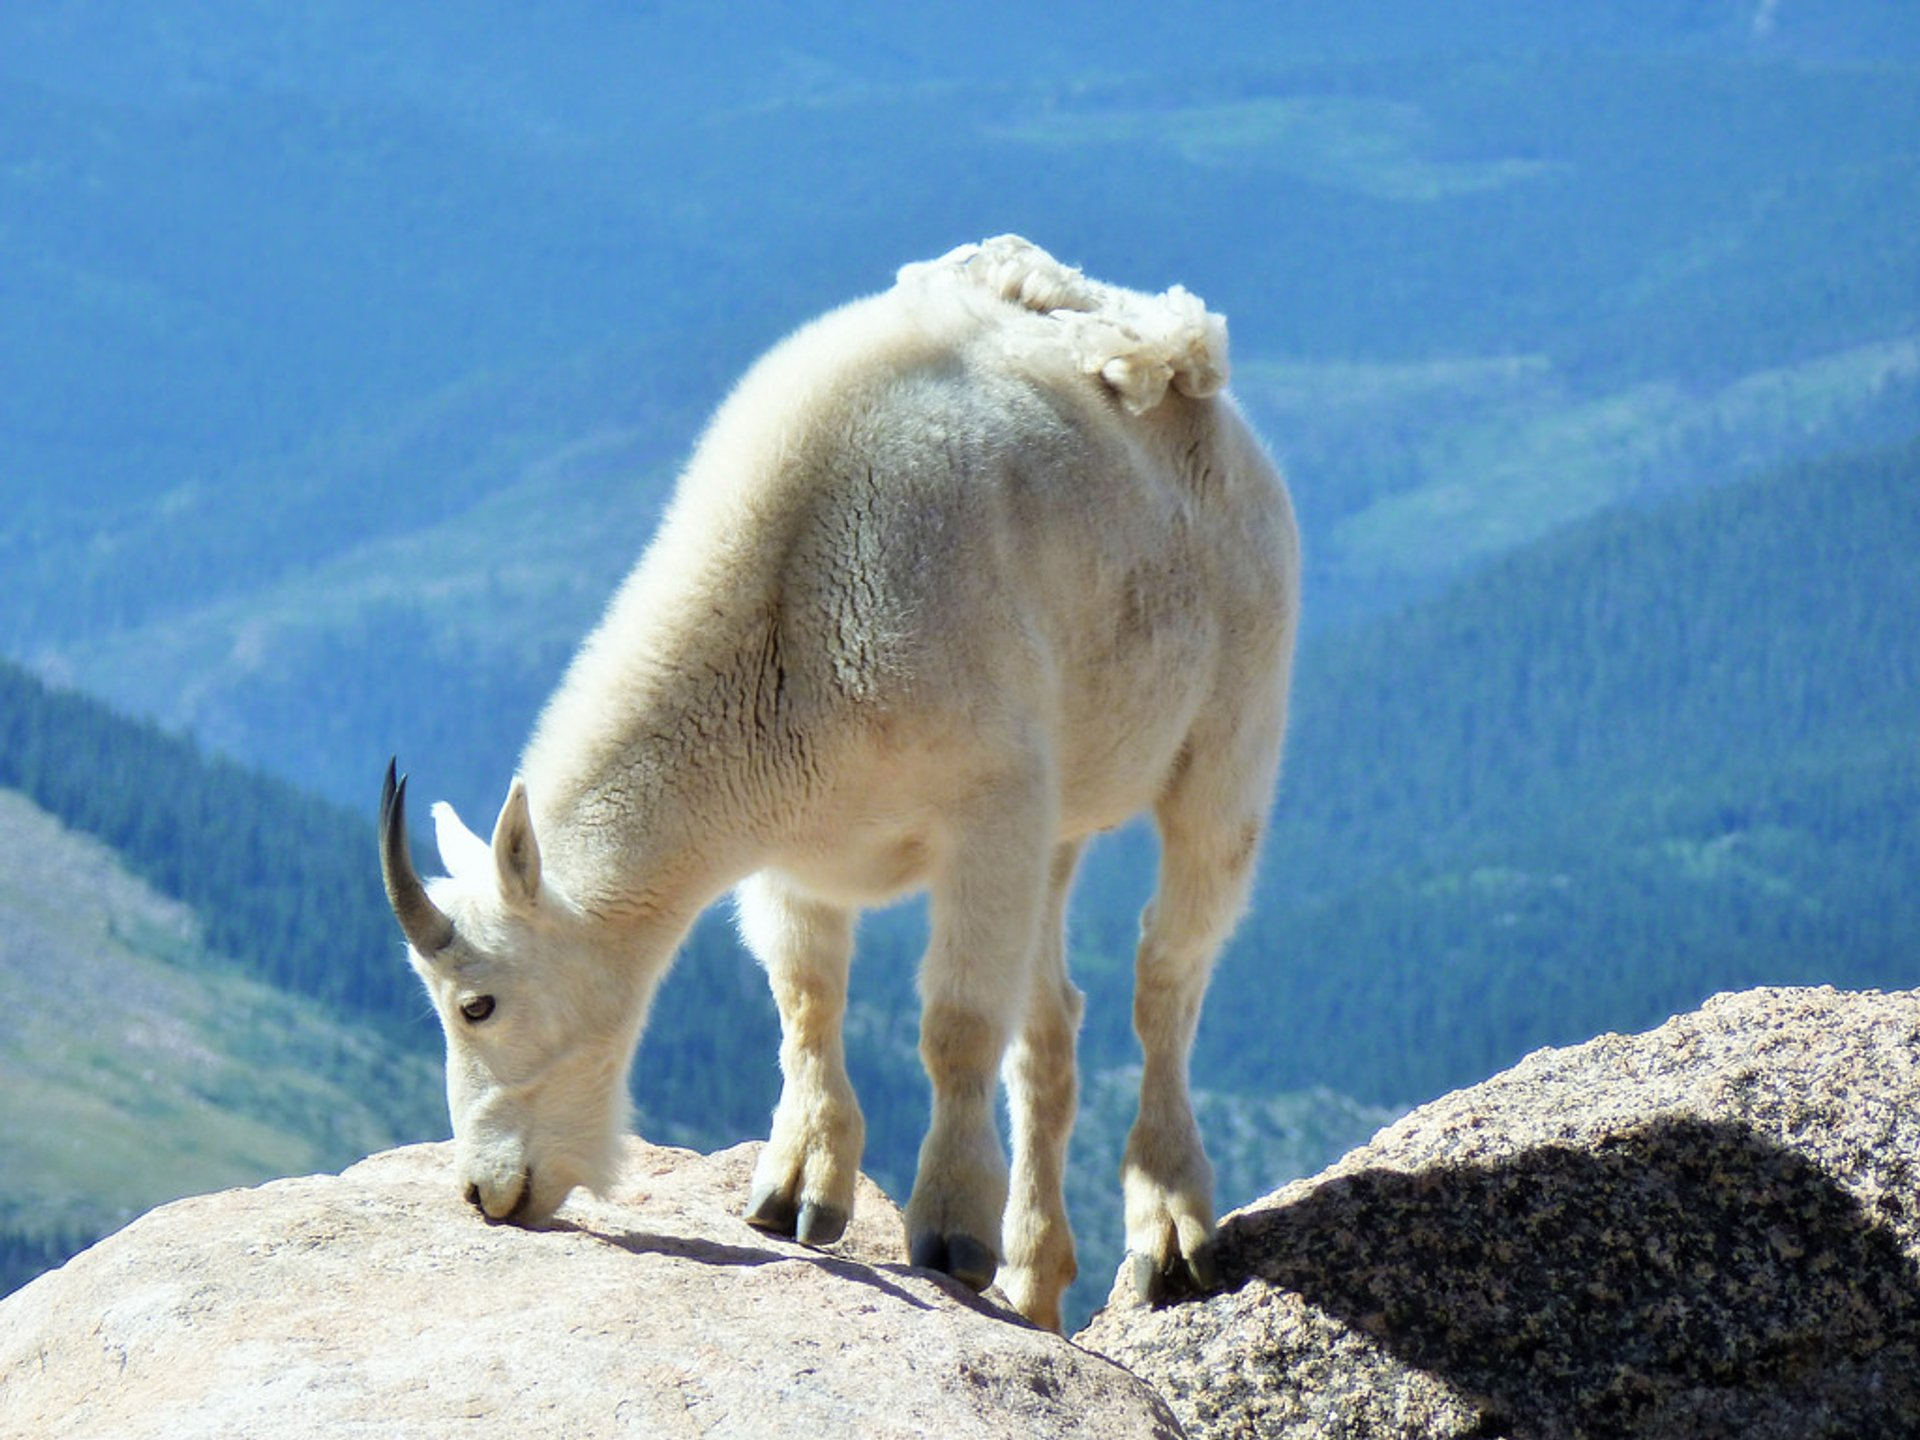 Rocky Mountain Goat 2019